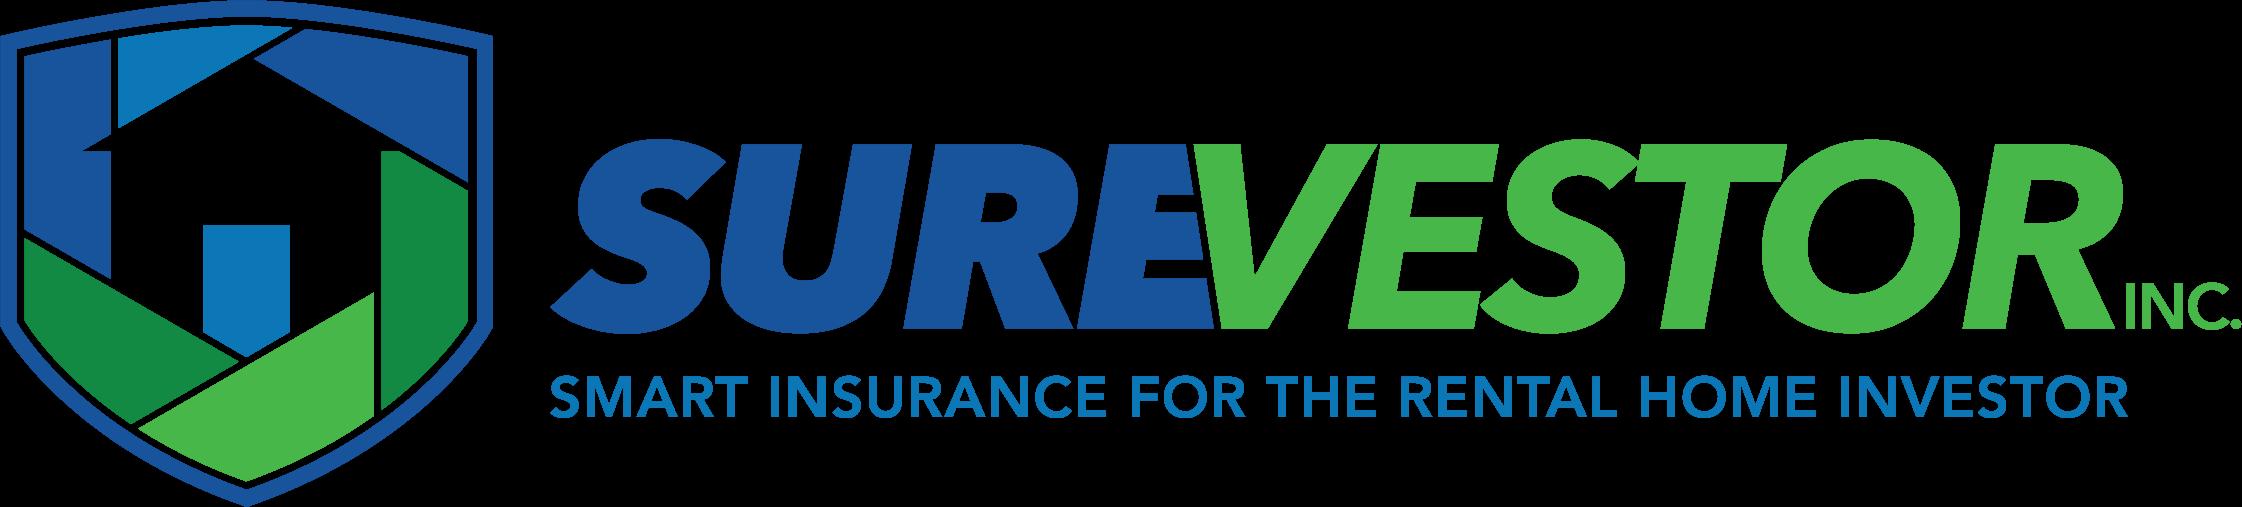 surevestor-horz-logo-inc.png